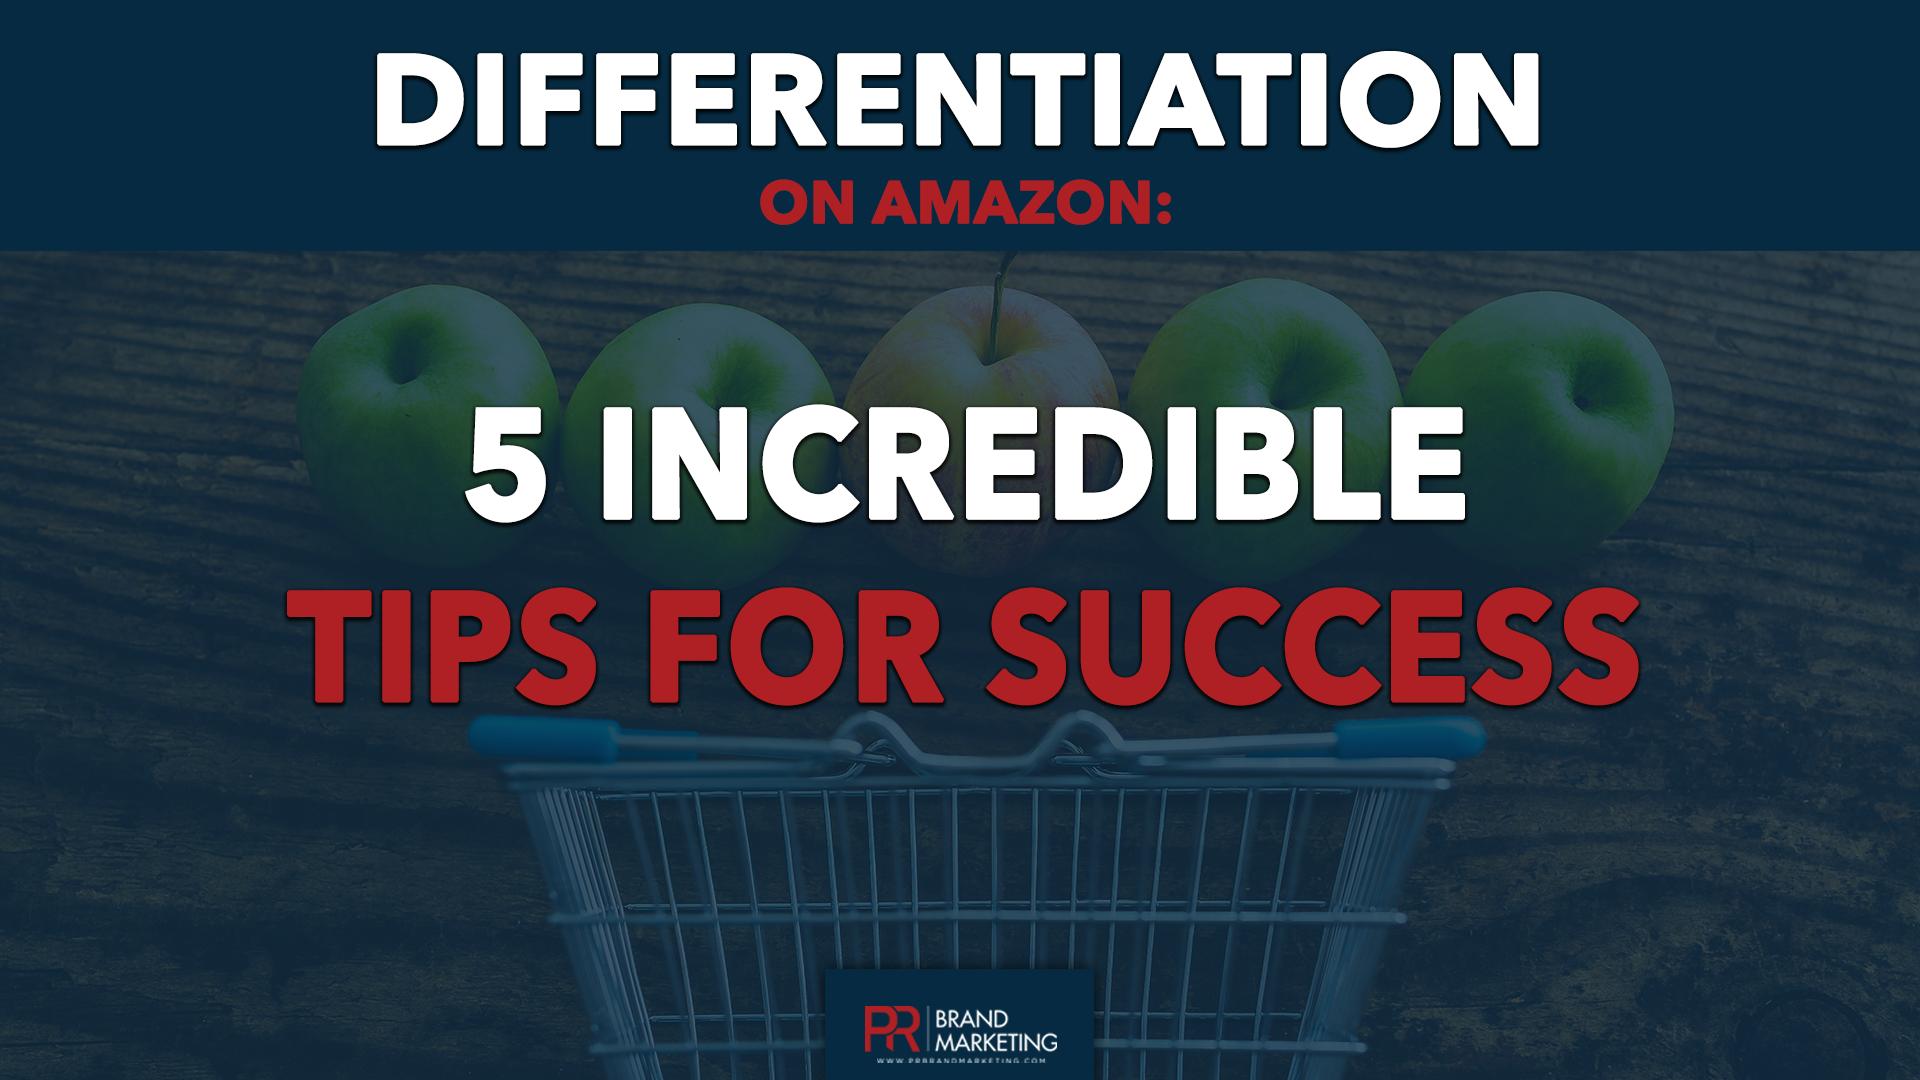 differentiation on amazon